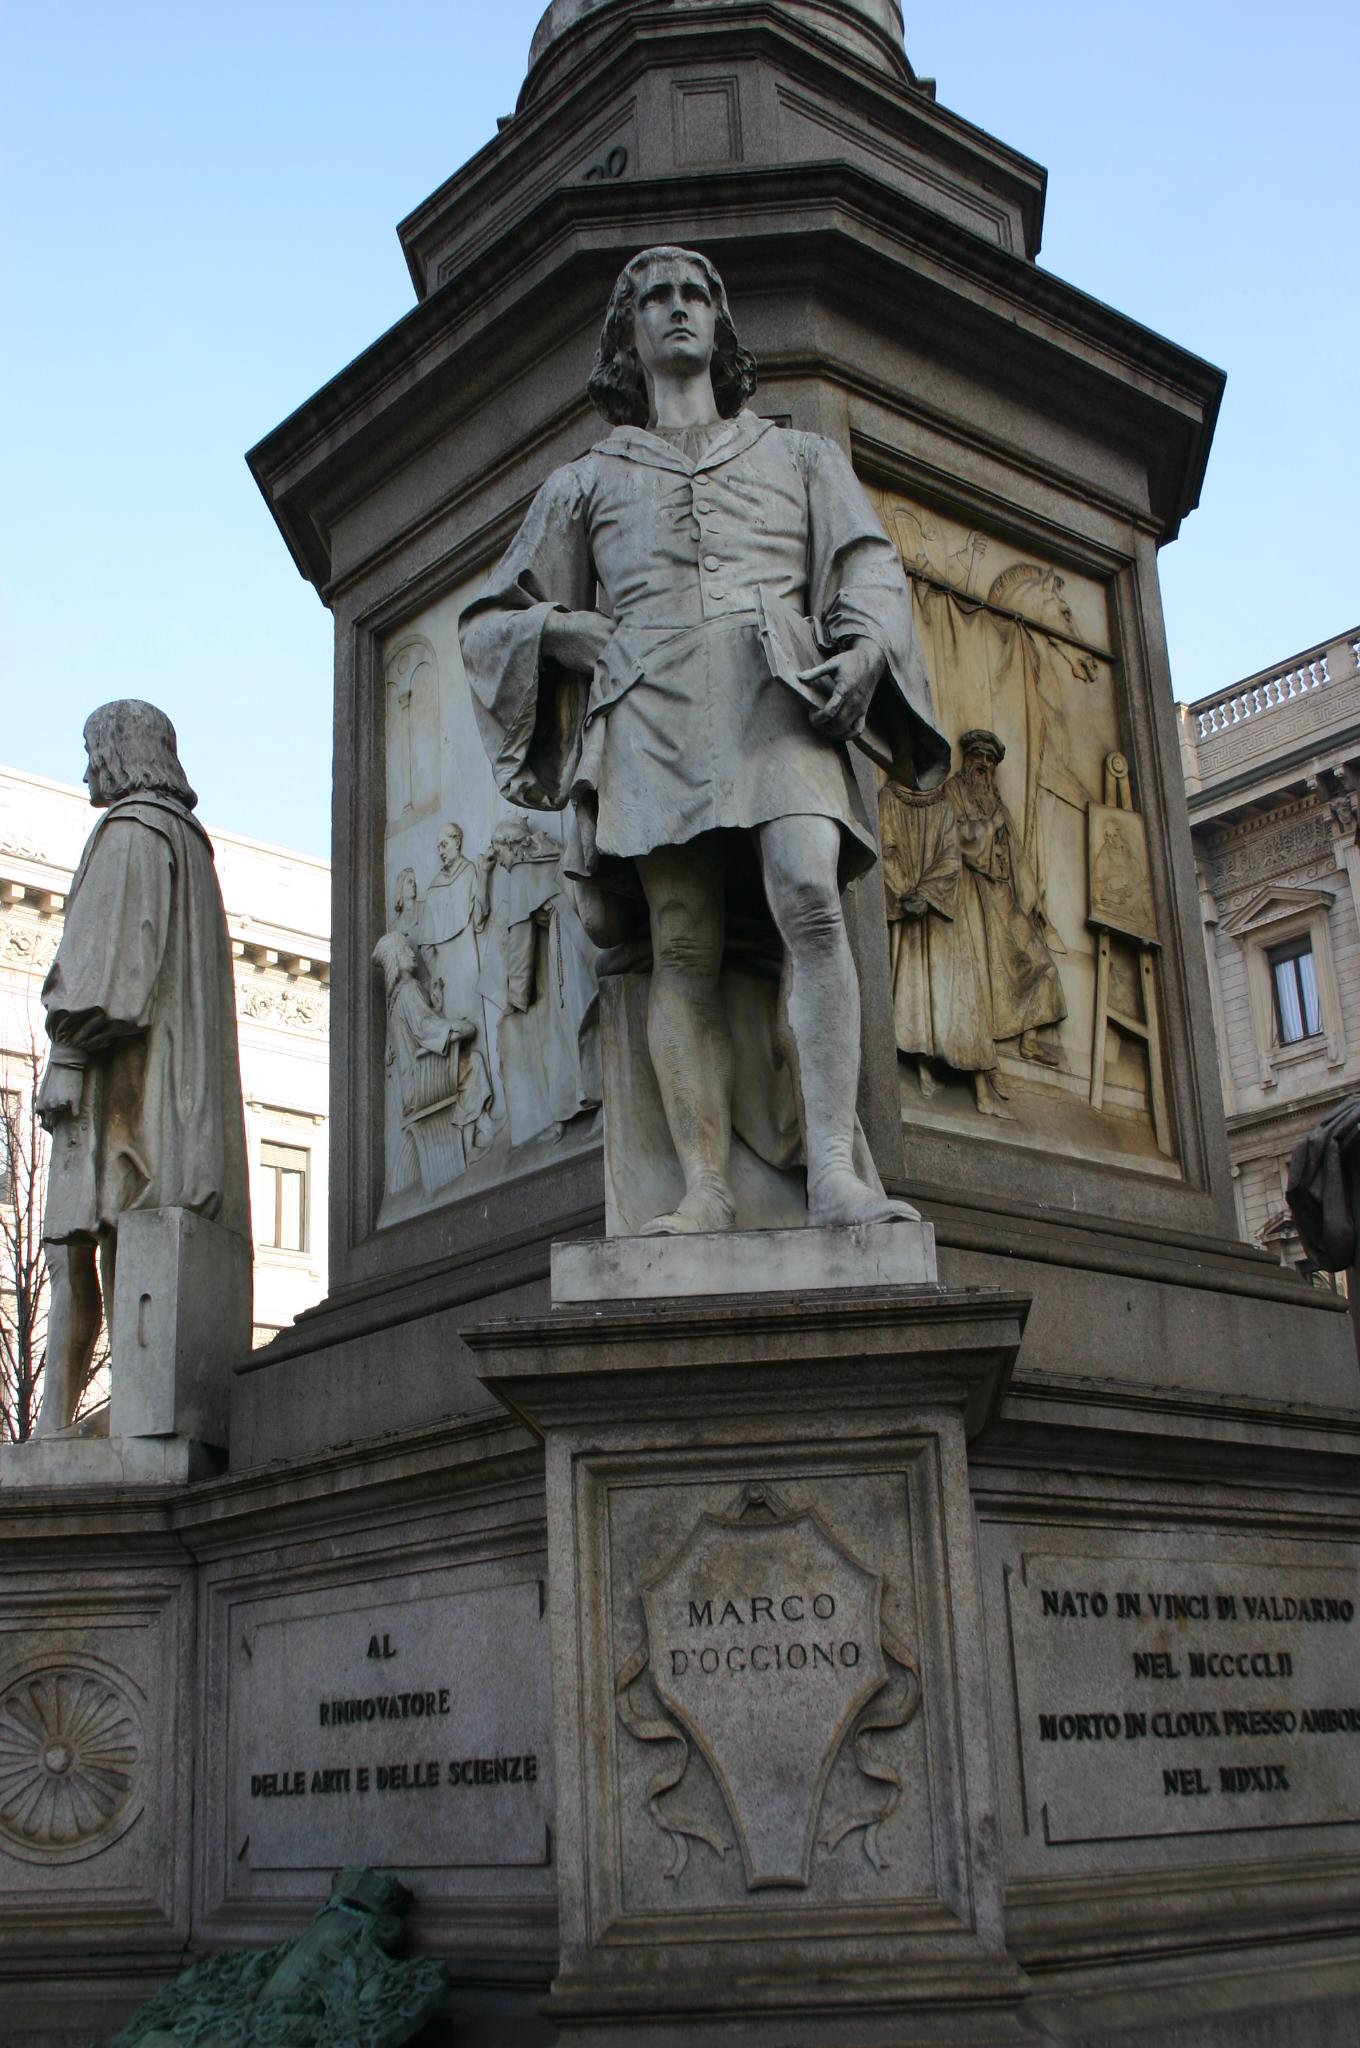 File:IMG 4299 - Milano, Monumento a Leonardo - Marco d\'Oggiono ...